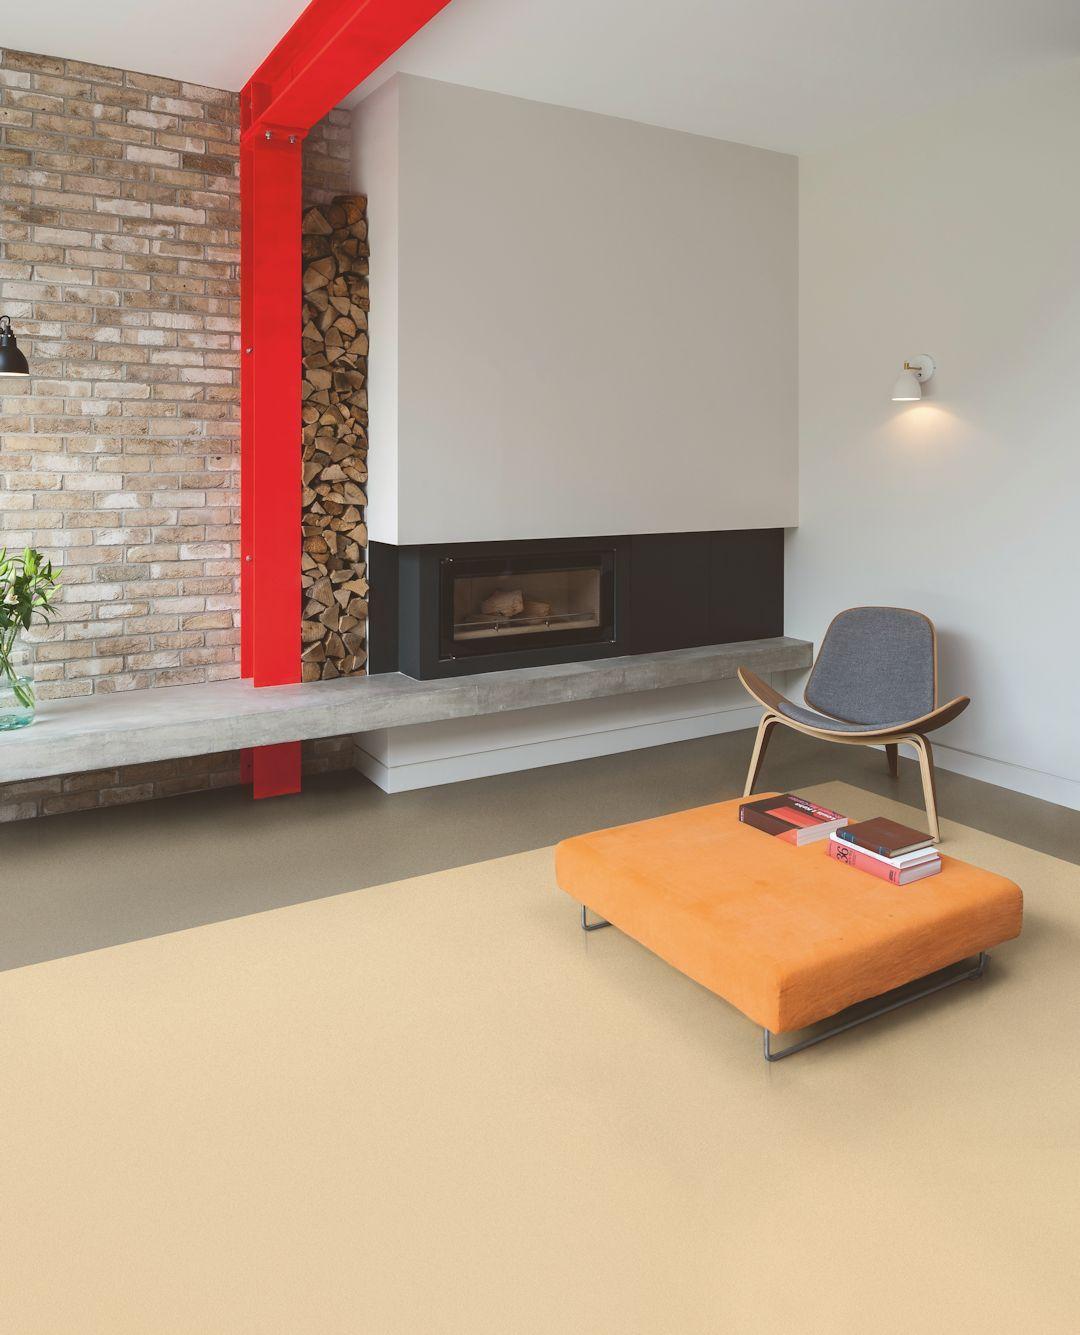 Polyflor Bloc Pur In Caramel Blush And Clay Deep Luxury Vinyl Tile Flexible Tile Vinyl Flooring